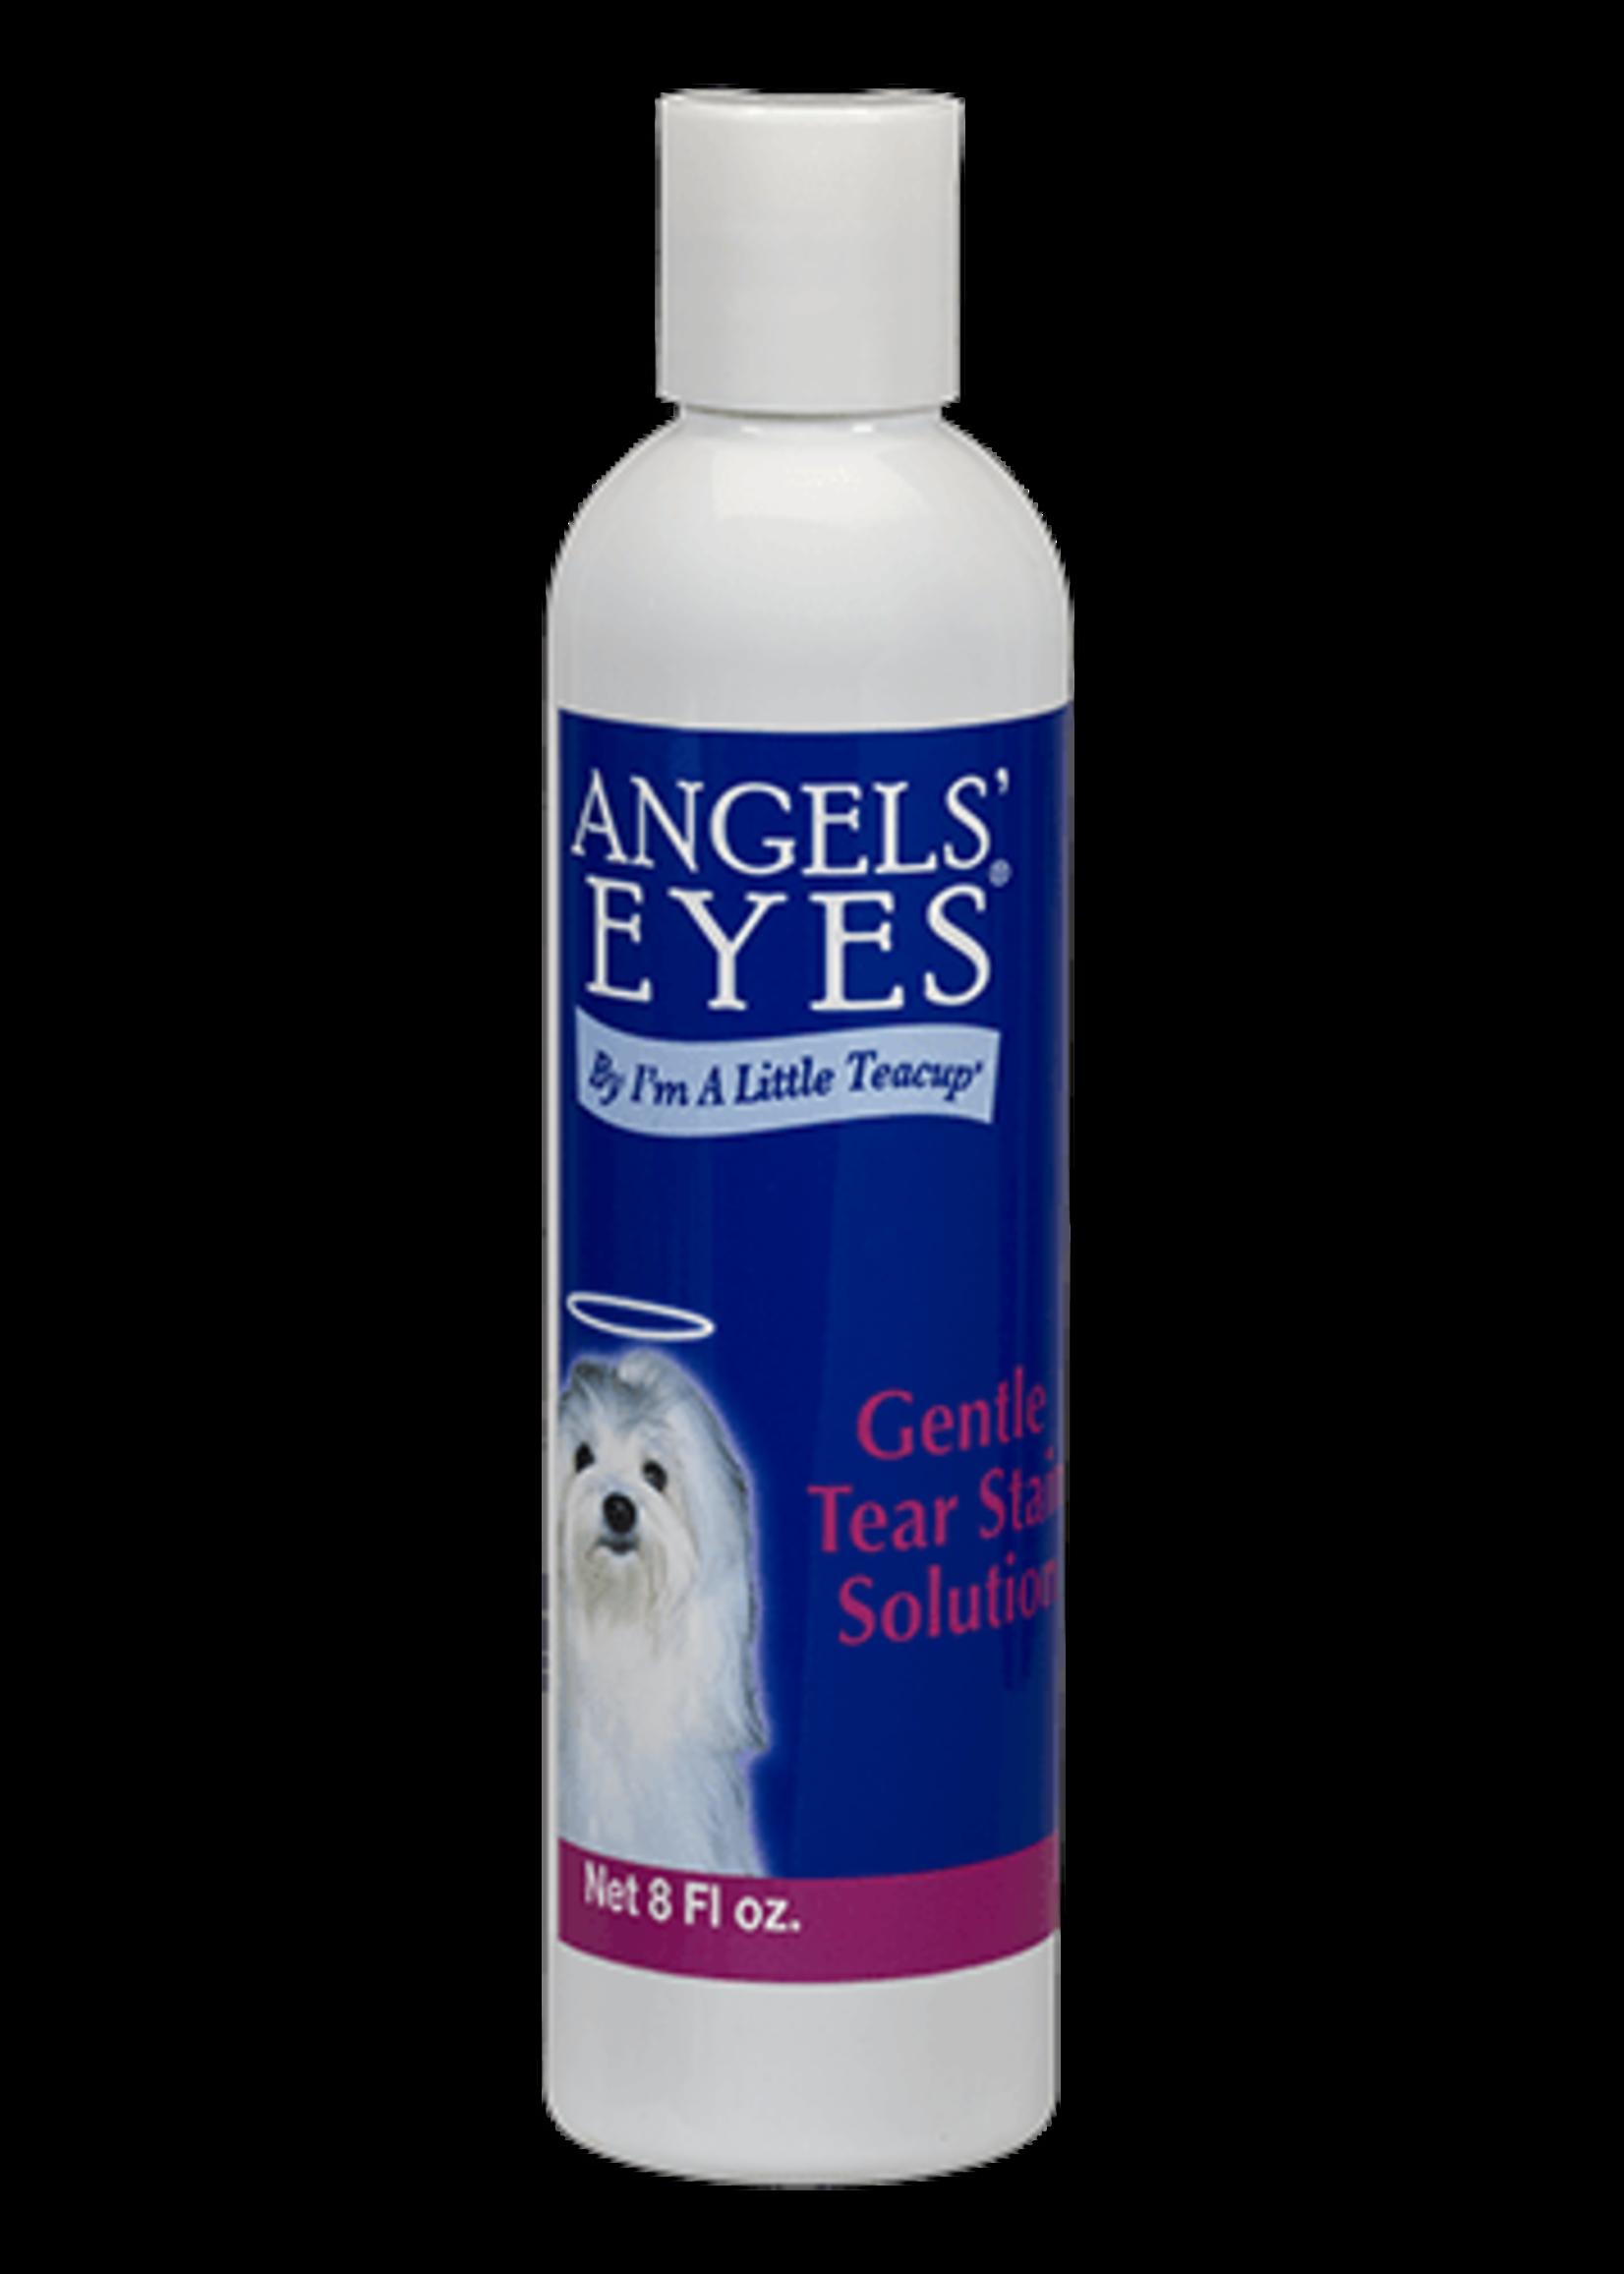 Angel Eyes Angels' Eyes Gentle Tear Stain Solution 8 oz